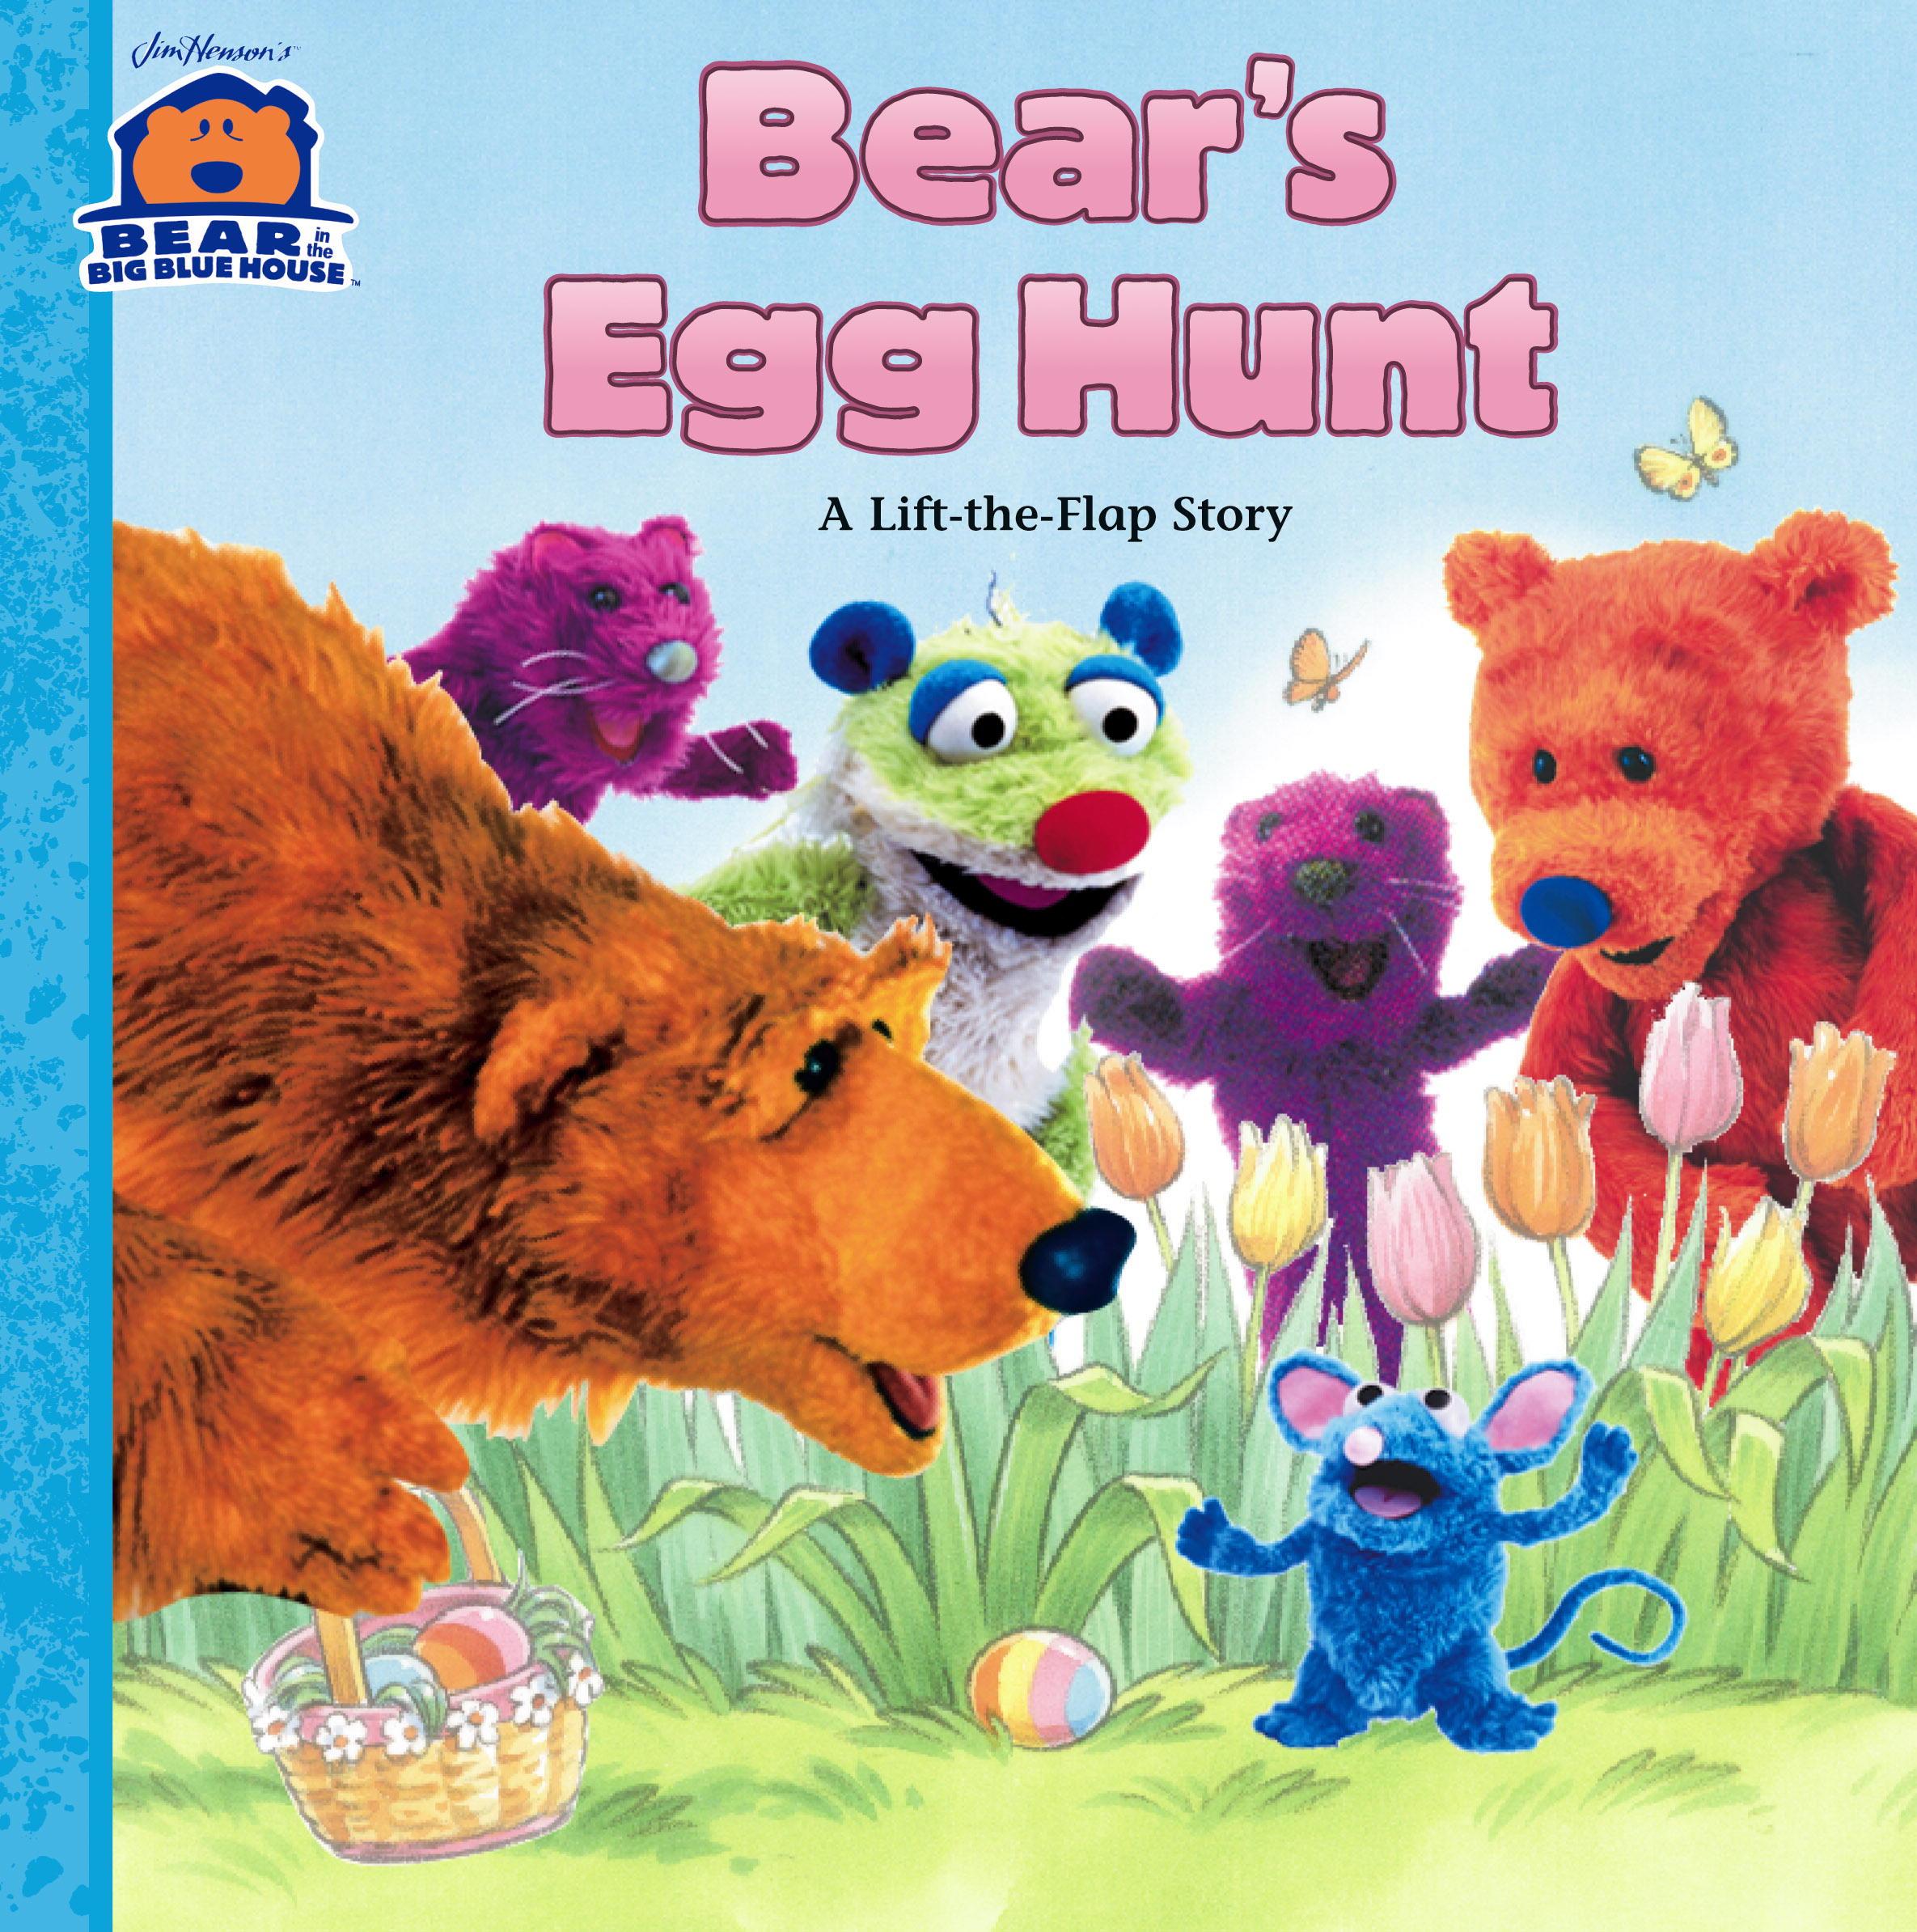 Bear's egg hunt : a lift-the-flap story